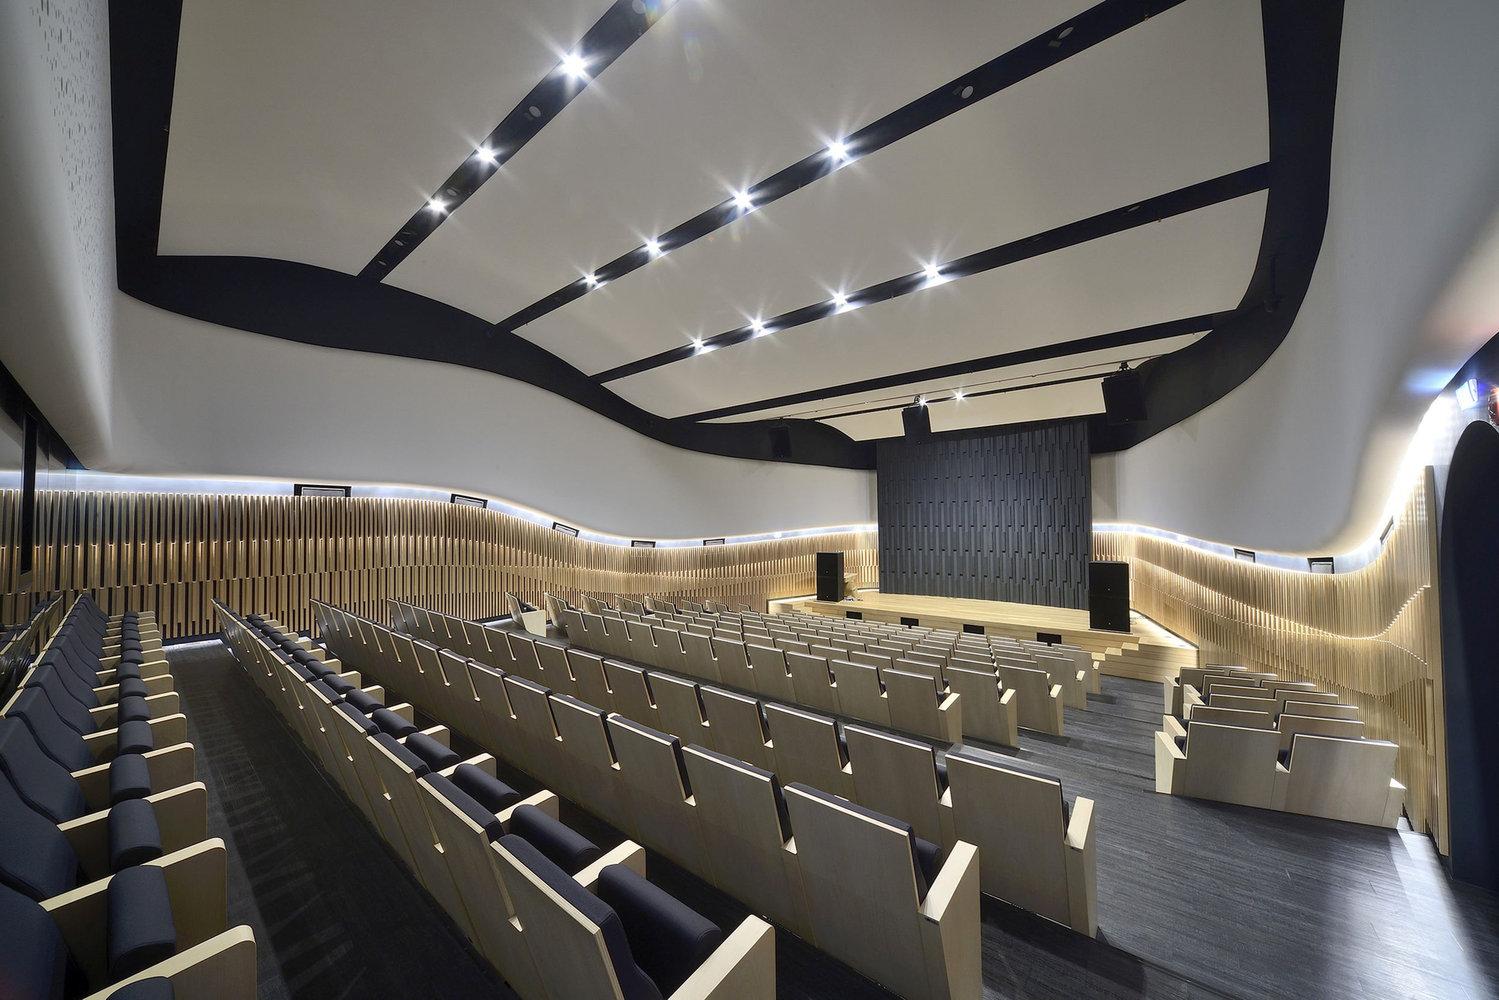 Museo de arte B&E Goulandris Vikelas Architects 03